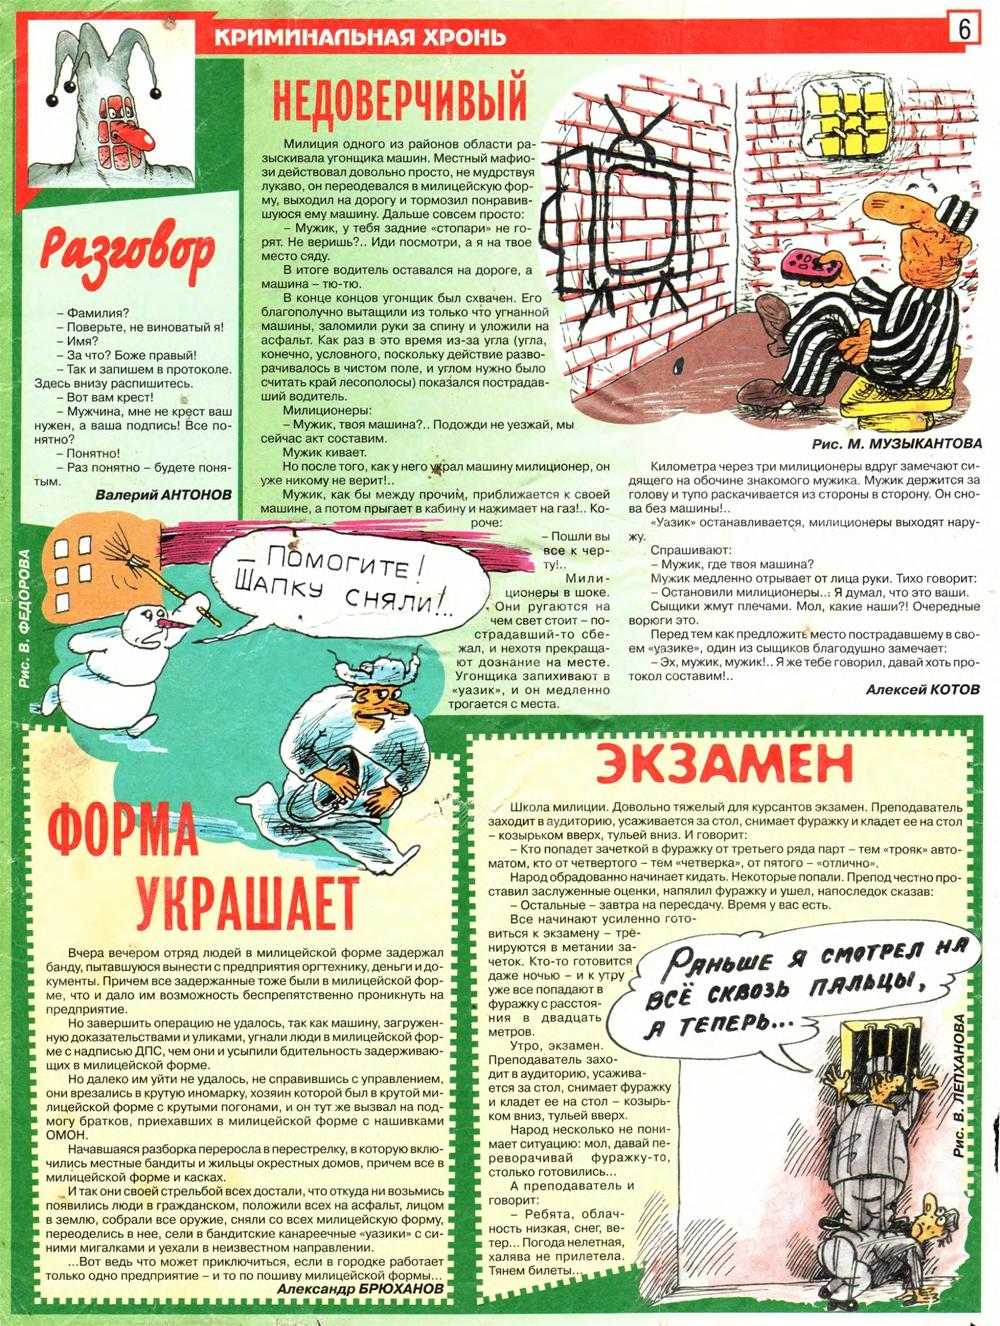 http://i5.imageban.ru/out/2013/12/21/2c0962950b2230be21e51bd55b29b3ee.jpg